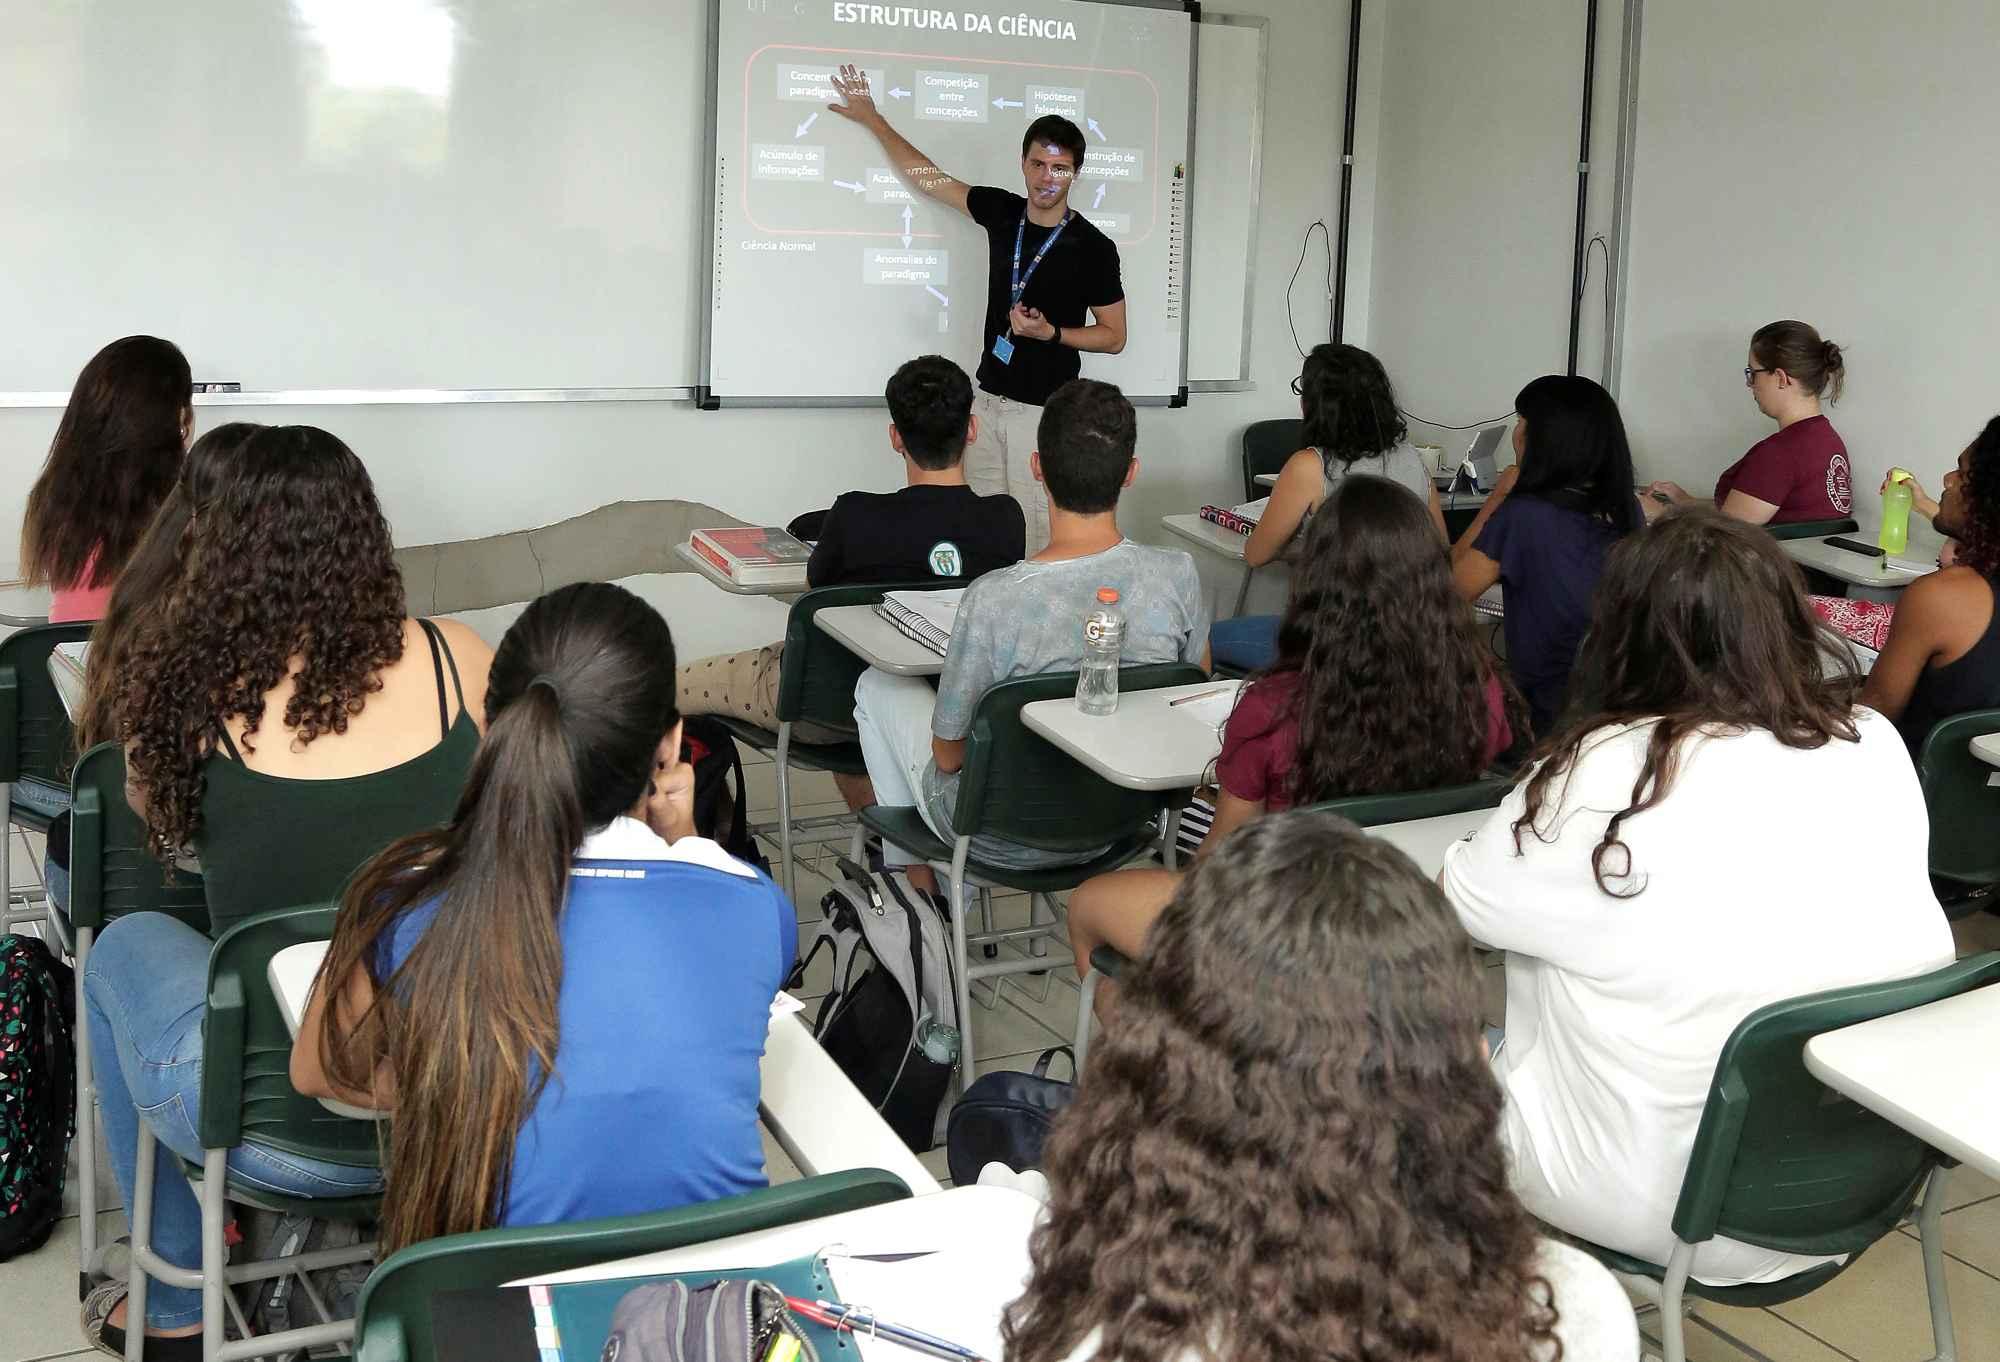 Sala de aula no campus Pampulha